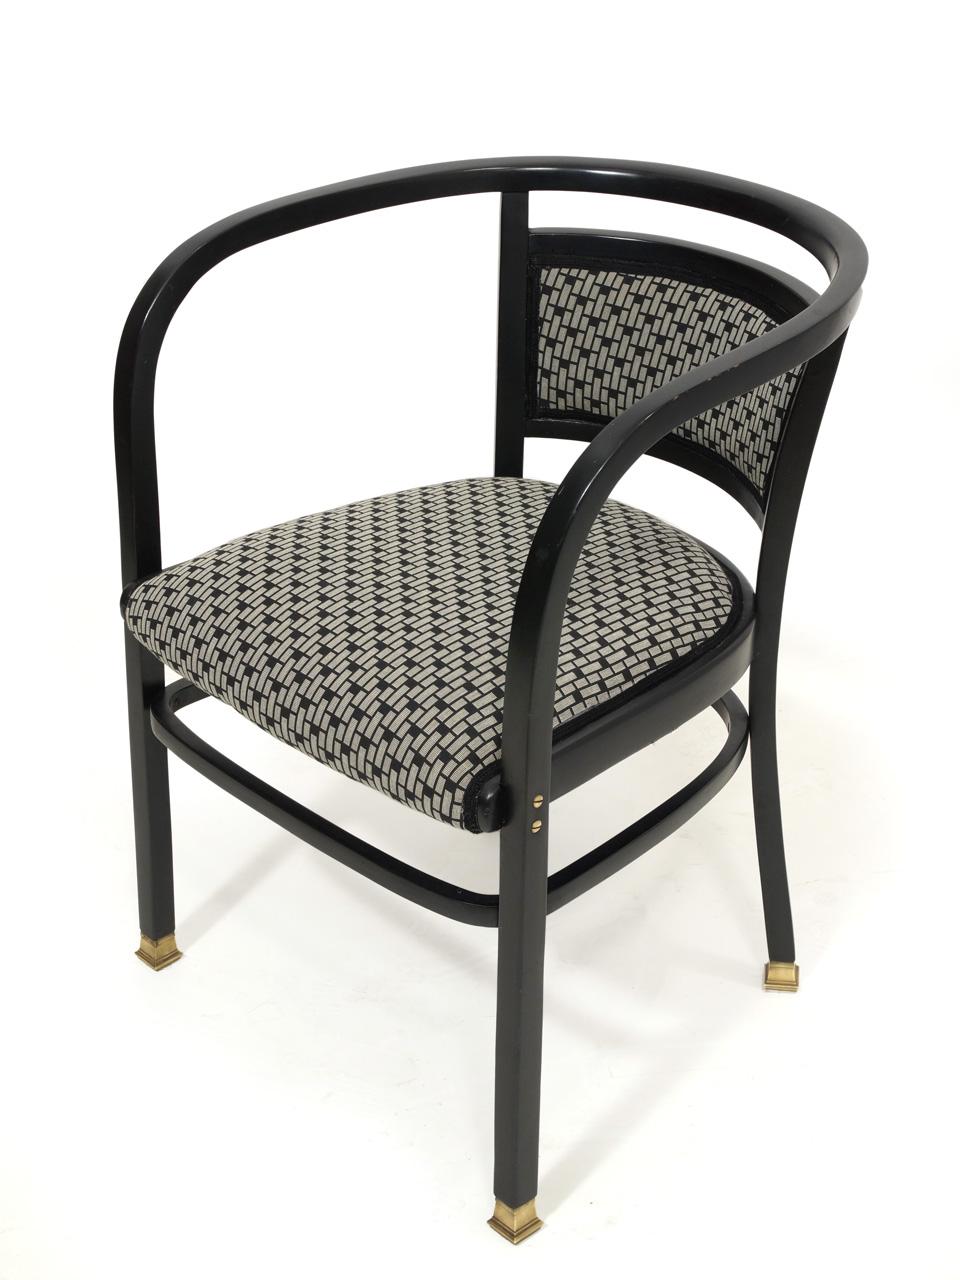 art nr 4079 zwei armlehnsessel dunkel poliert firma thonet entwurf nach otto wagner fotos. Black Bedroom Furniture Sets. Home Design Ideas